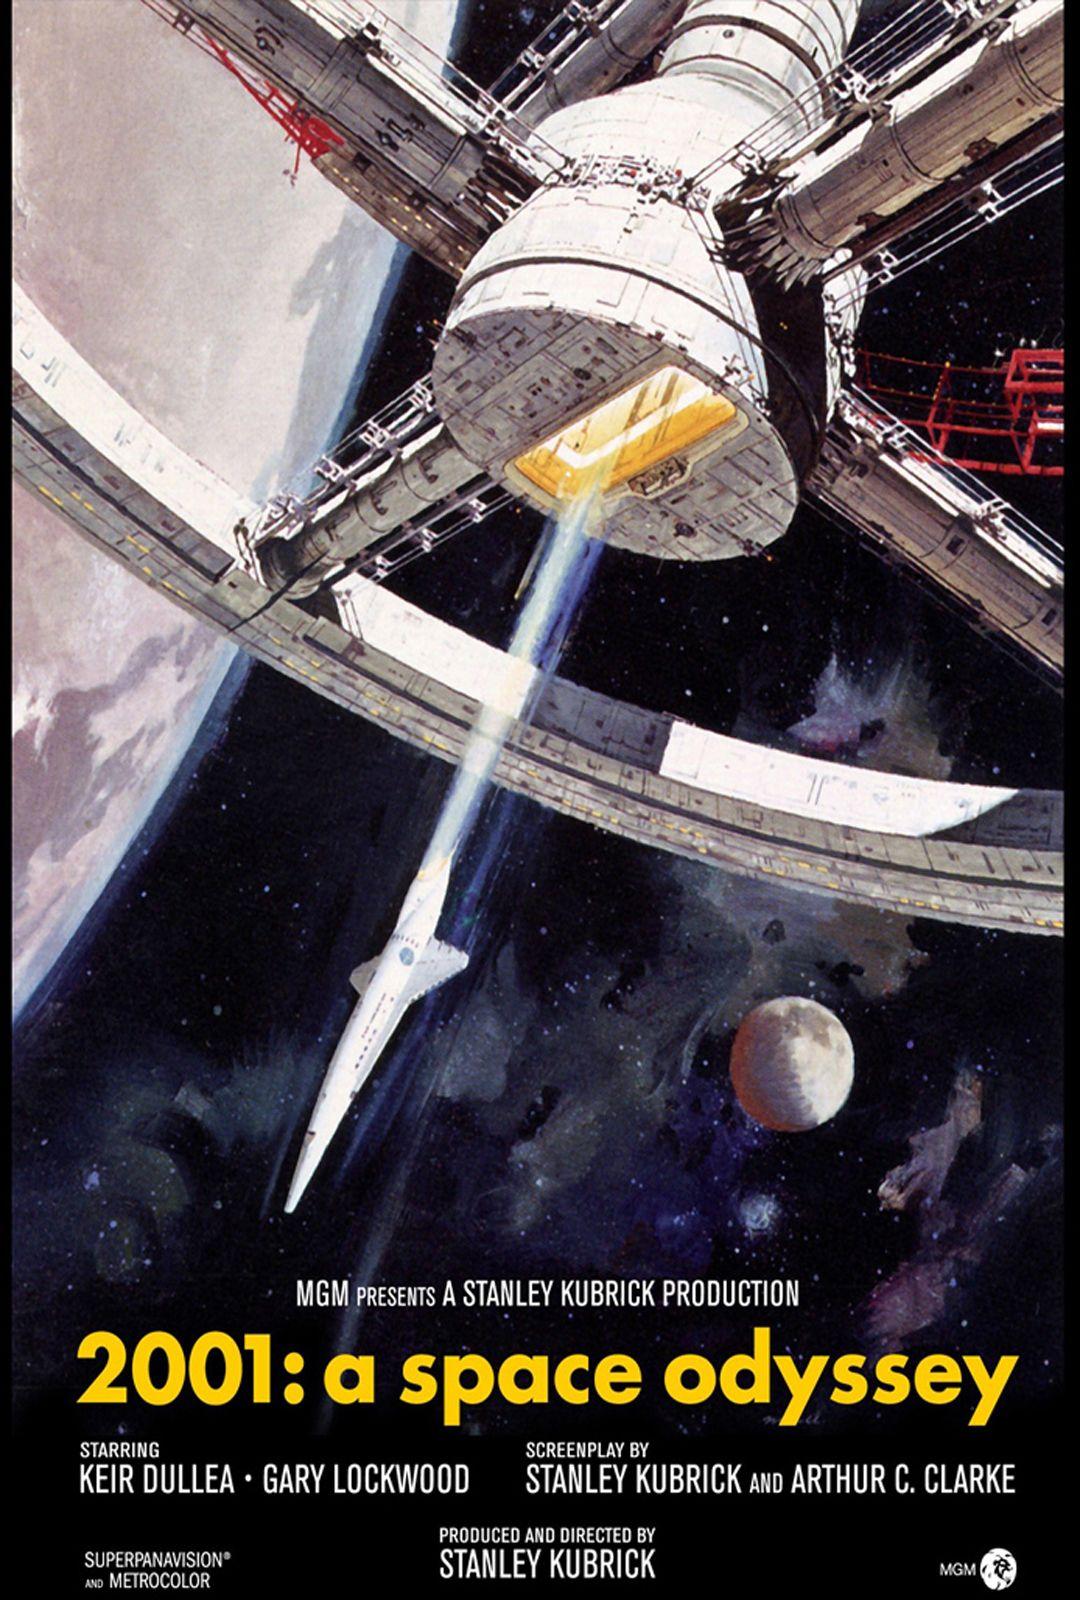 Keir Dullea Gary Lockwood William Sylvester Dir Stanley Kubrick Imdb 8 3 Htt 2001 A Space Odyssey Space Odyssey Stanley Kubrick